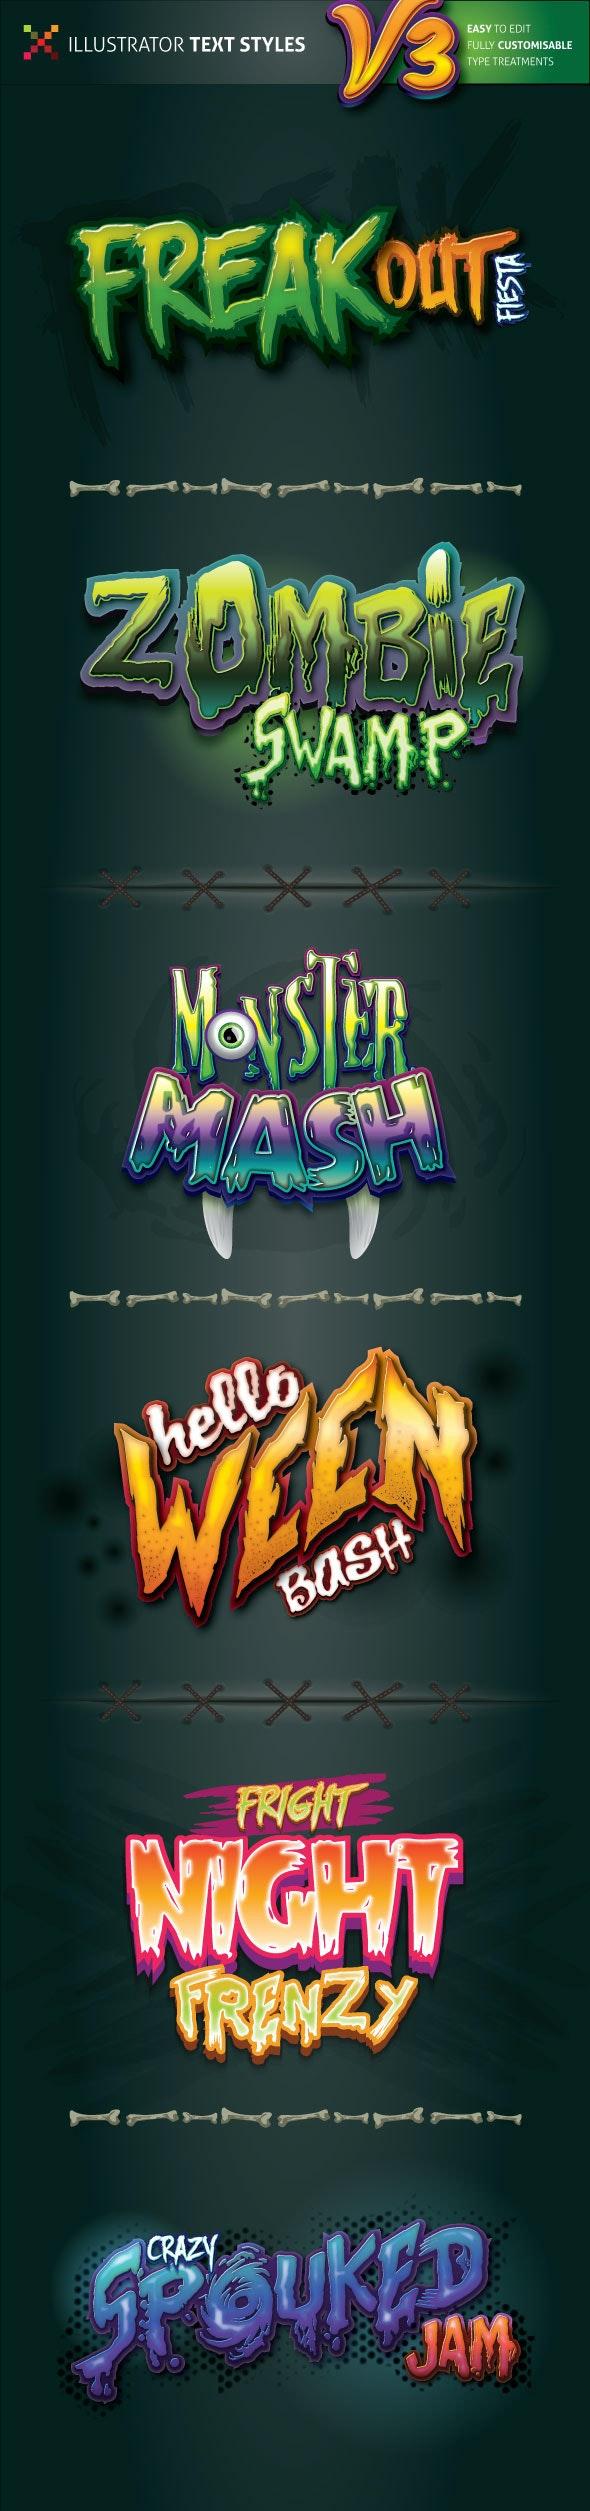 Spooky Illustrator Text Styles v3 - Styles Illustrator